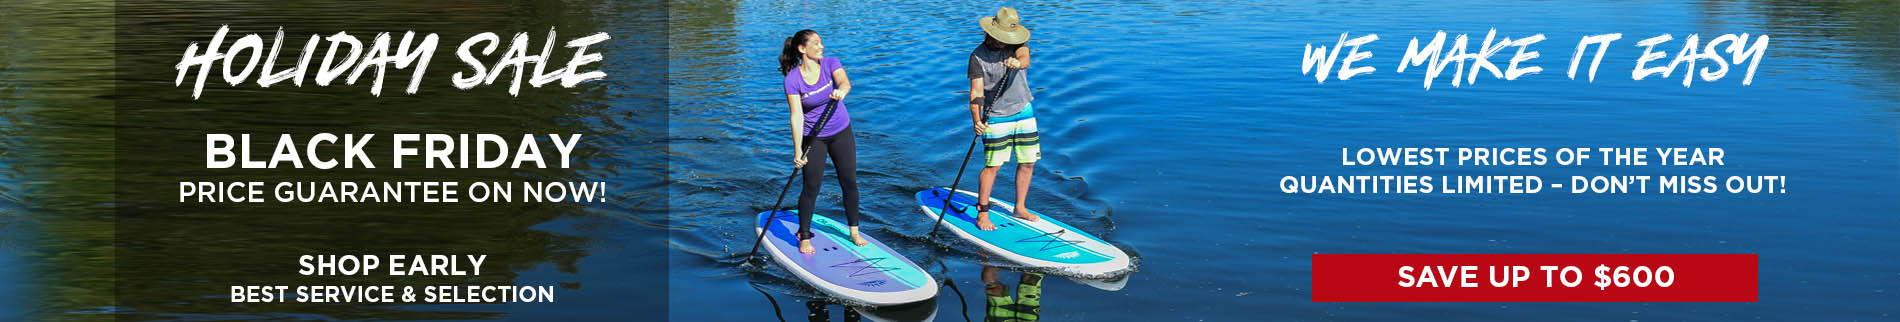 Paddleboard Direct Couple Paddling  Cruiser SUP Dura-Maxx | Holiday Paddle Board Sale